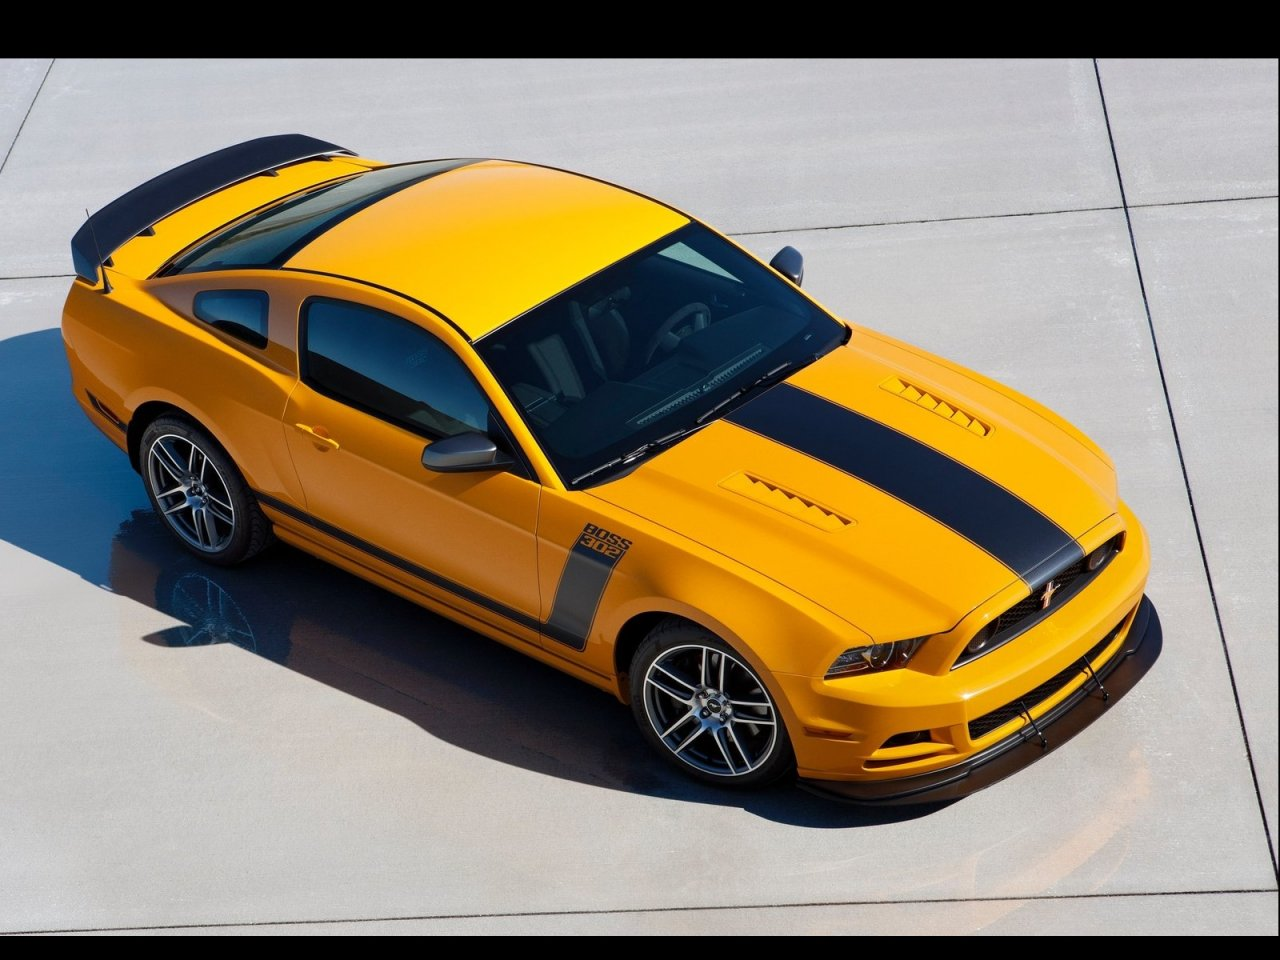 Ford Mustang Boss 302 Laptimes Specs Performance Data